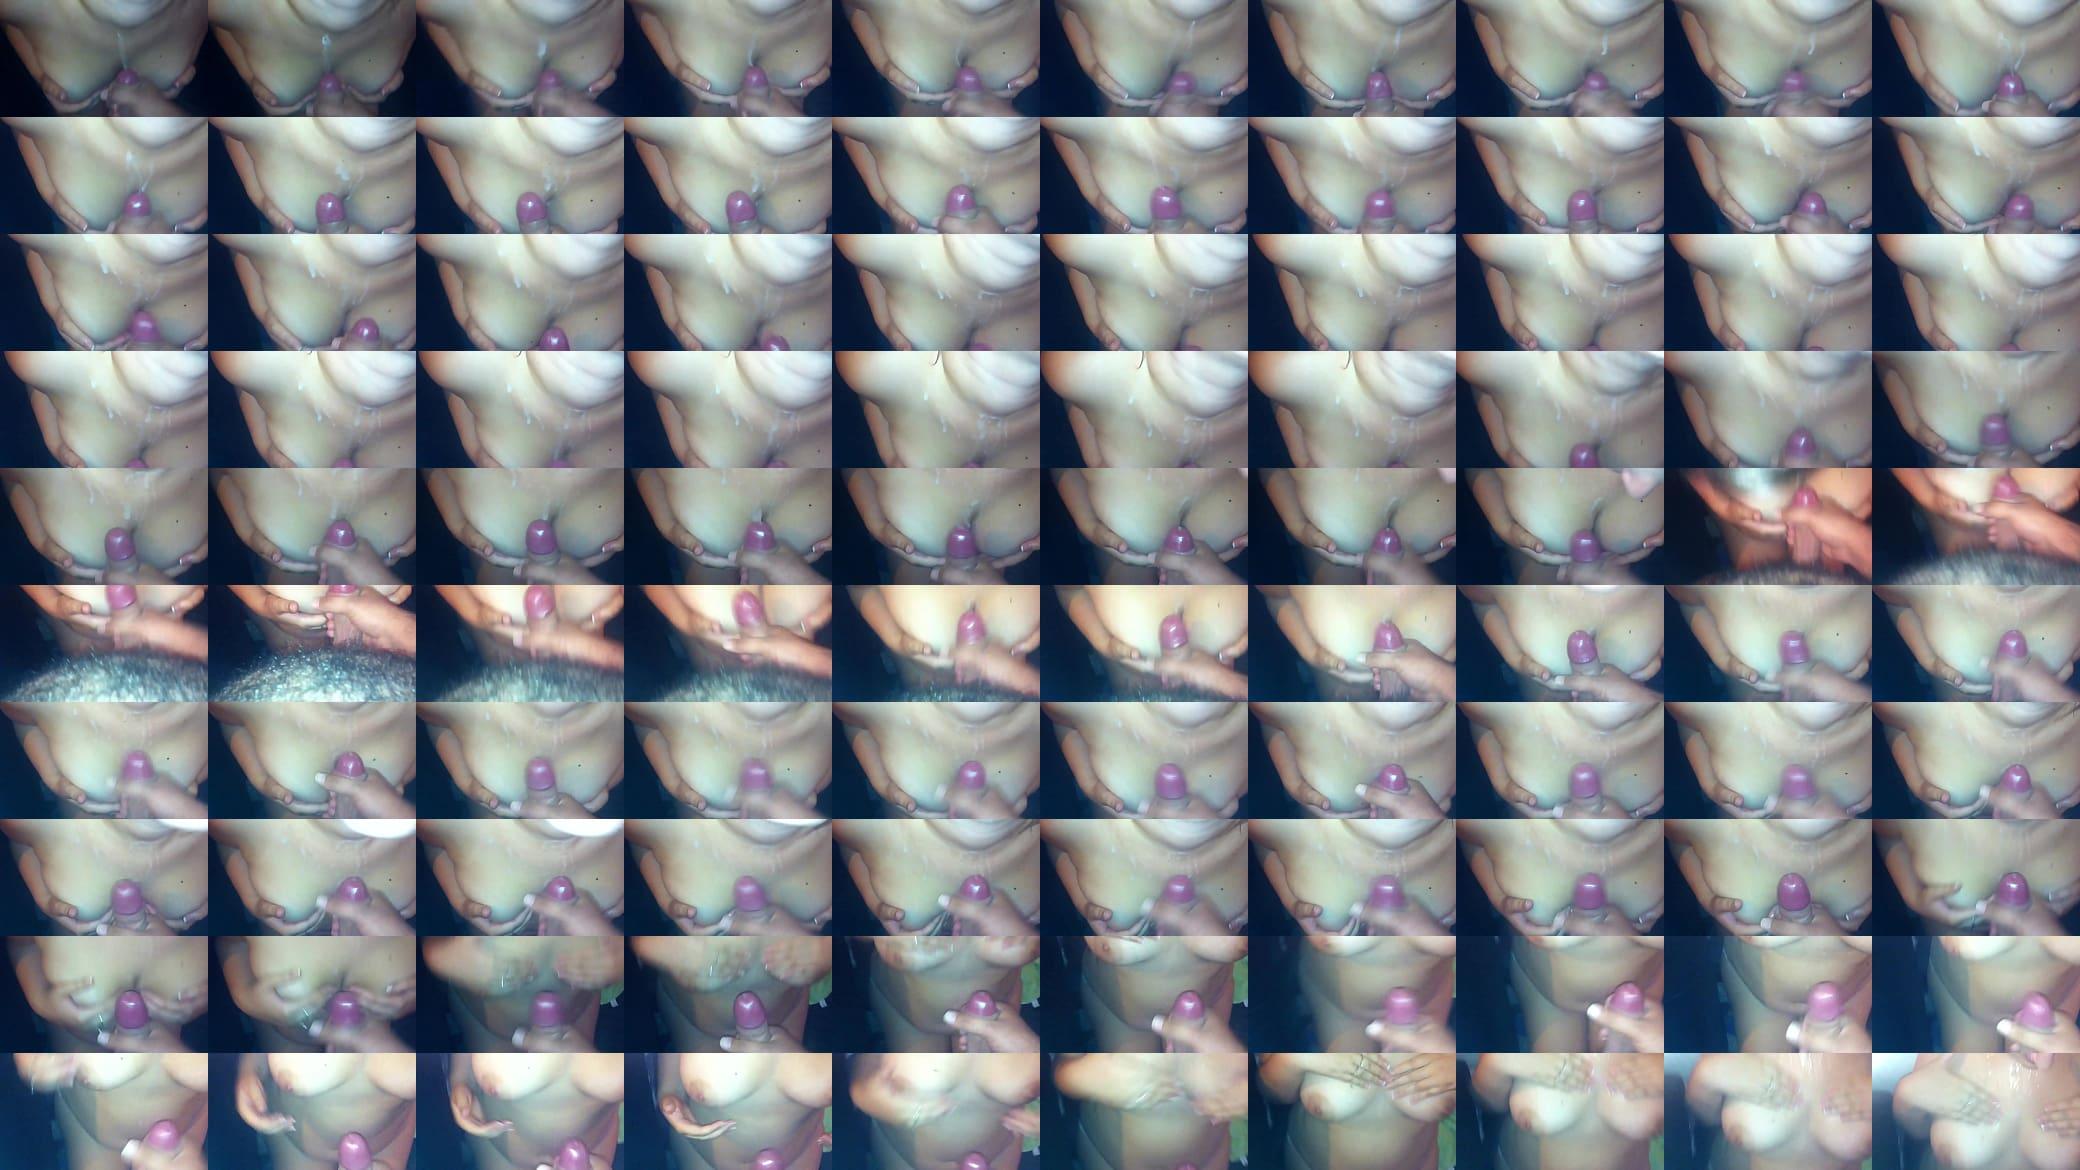 Xxx Busty ebony cam girl live cams for sex stream live sex gapingcams com tmb